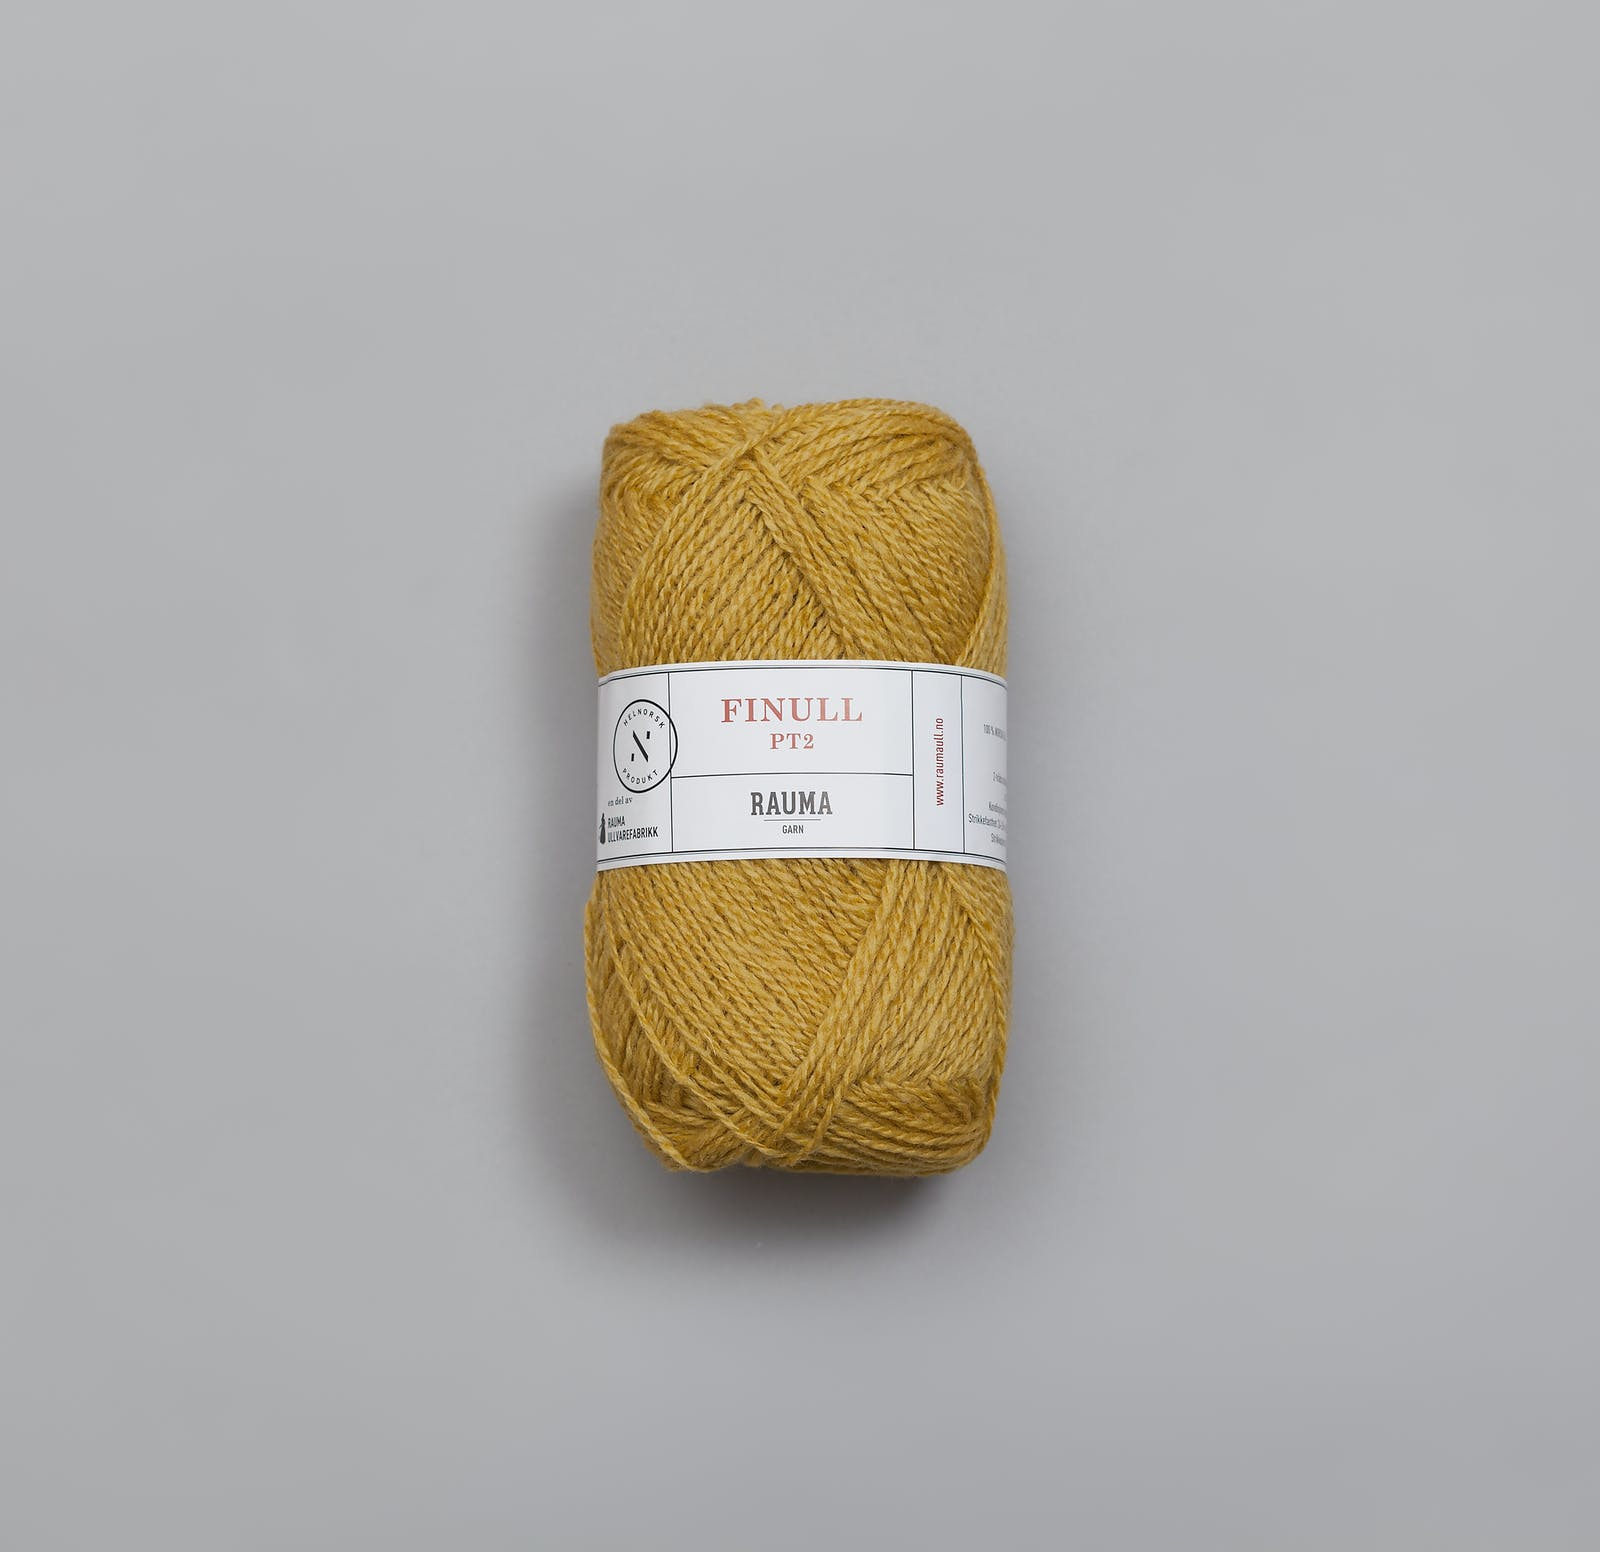 Raiuma Finull-PT2-4805